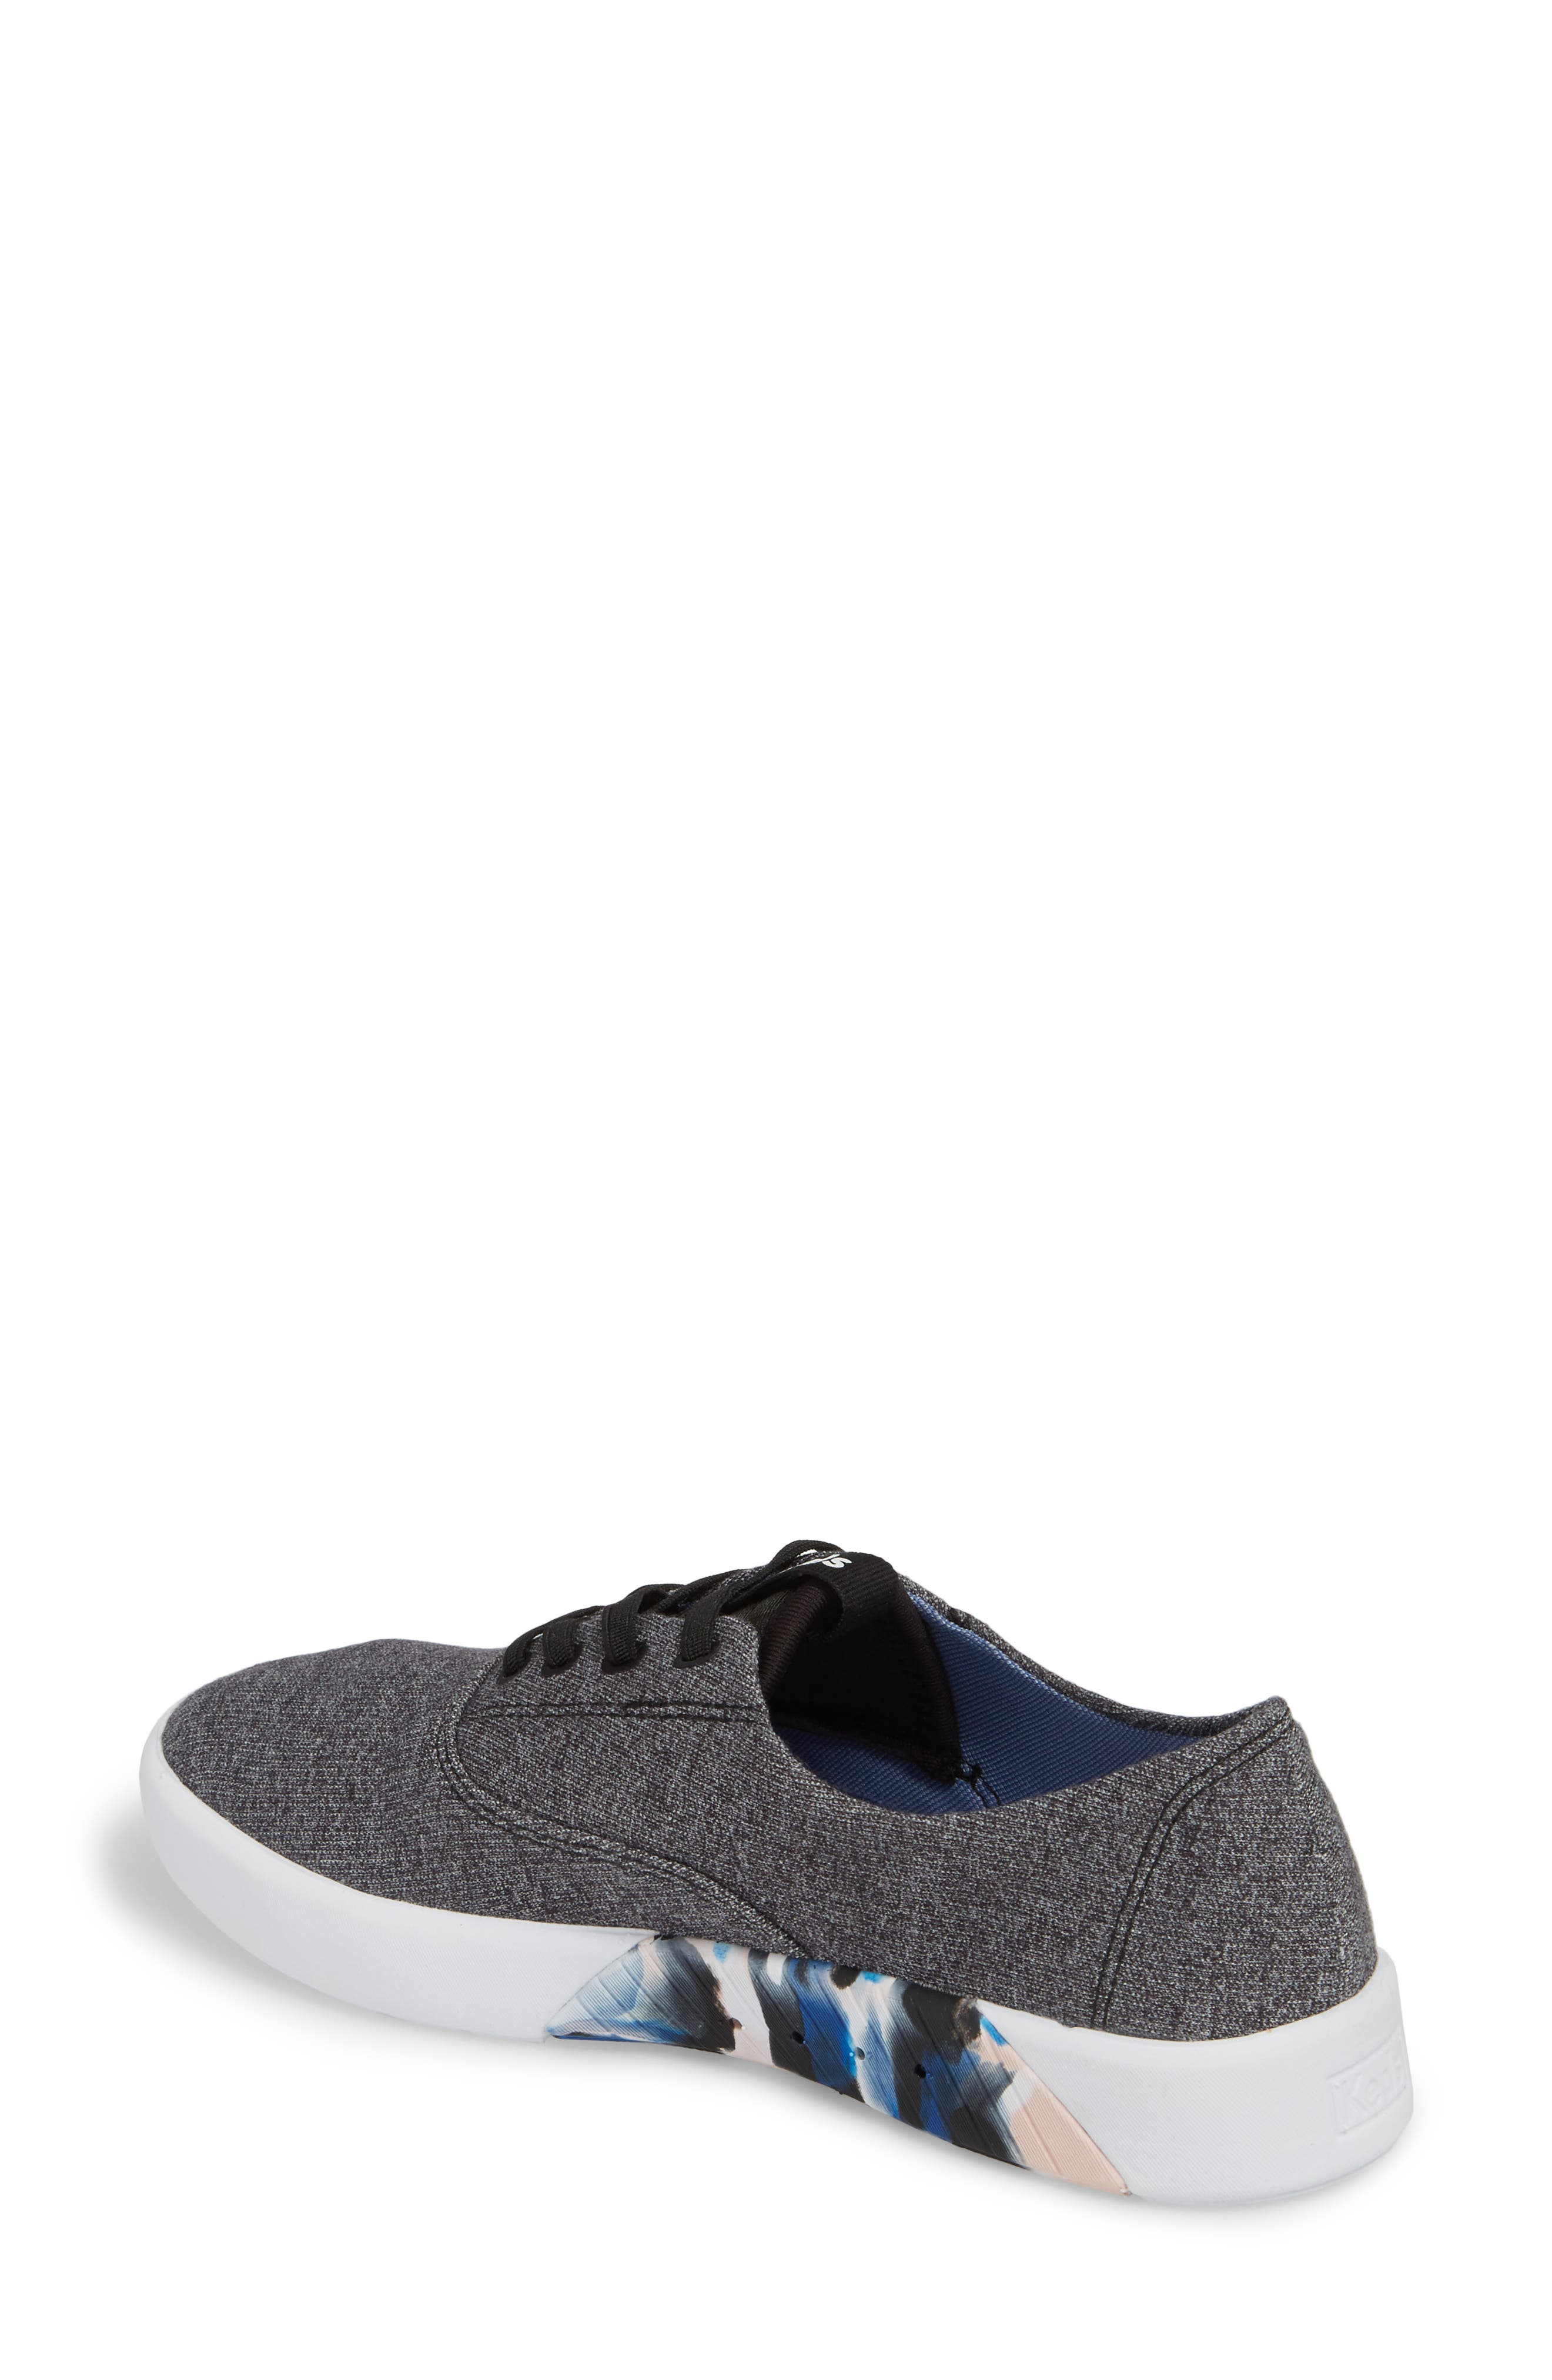 Studio Leap Sneaker,                             Alternate thumbnail 2, color,                             Charcoal